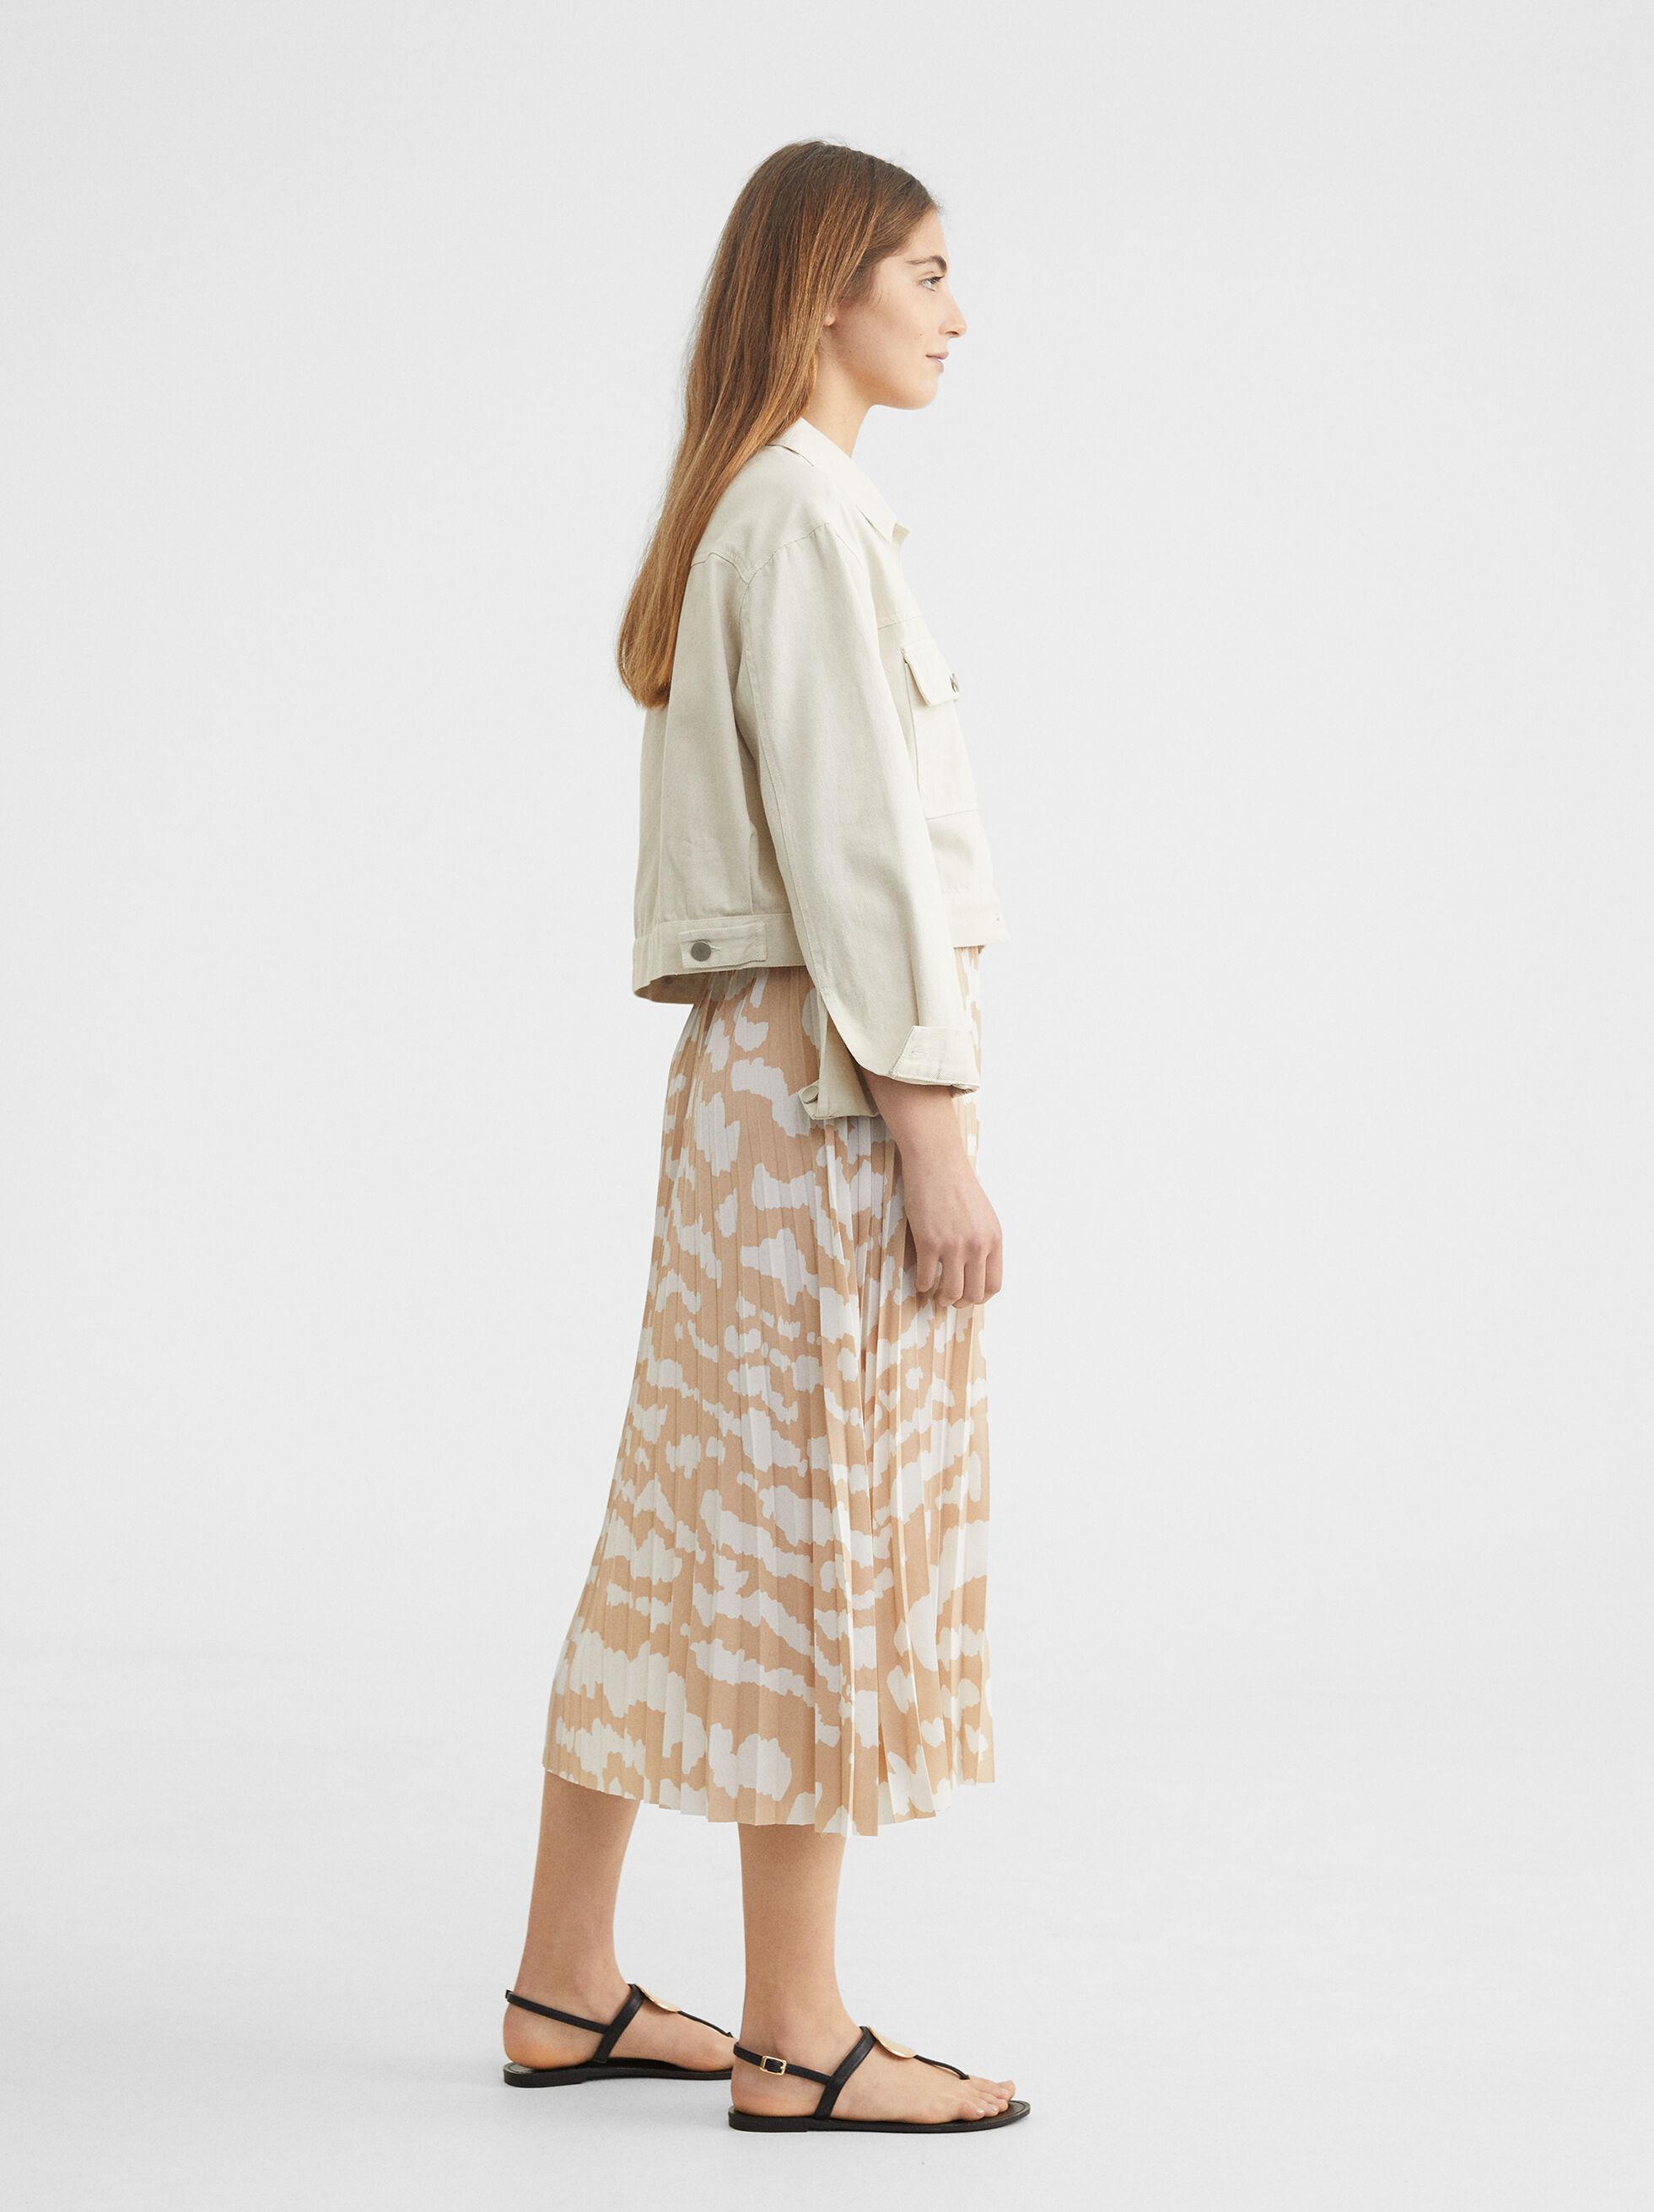 Pleated Skirt With An Elastic Waistband, Beige, hi-res